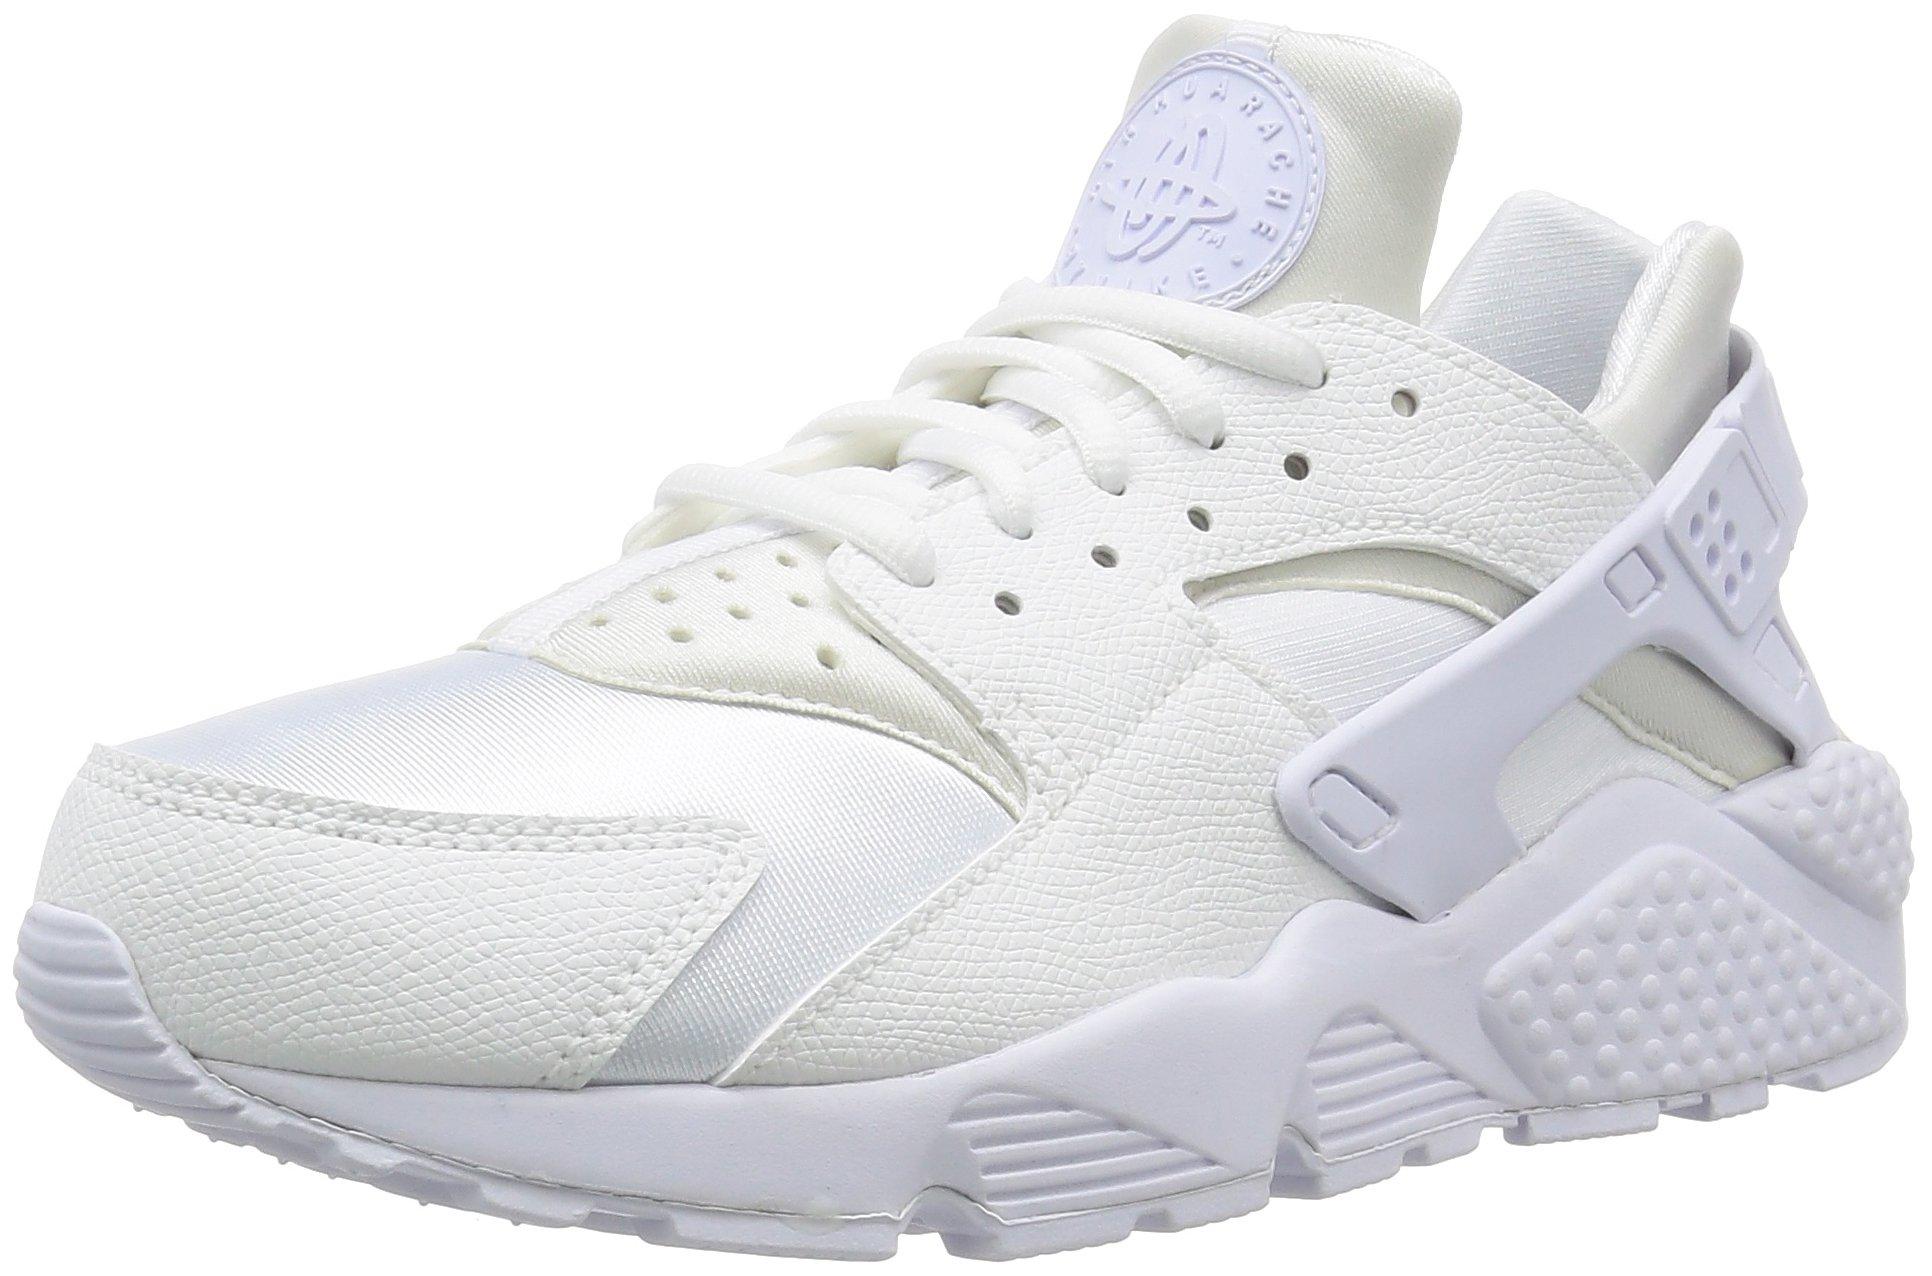 save off 3700f fbb54 Galleon - Nike WMNS Air Huarache Run, Women s Trainers, White  (White White), 7.5 UK